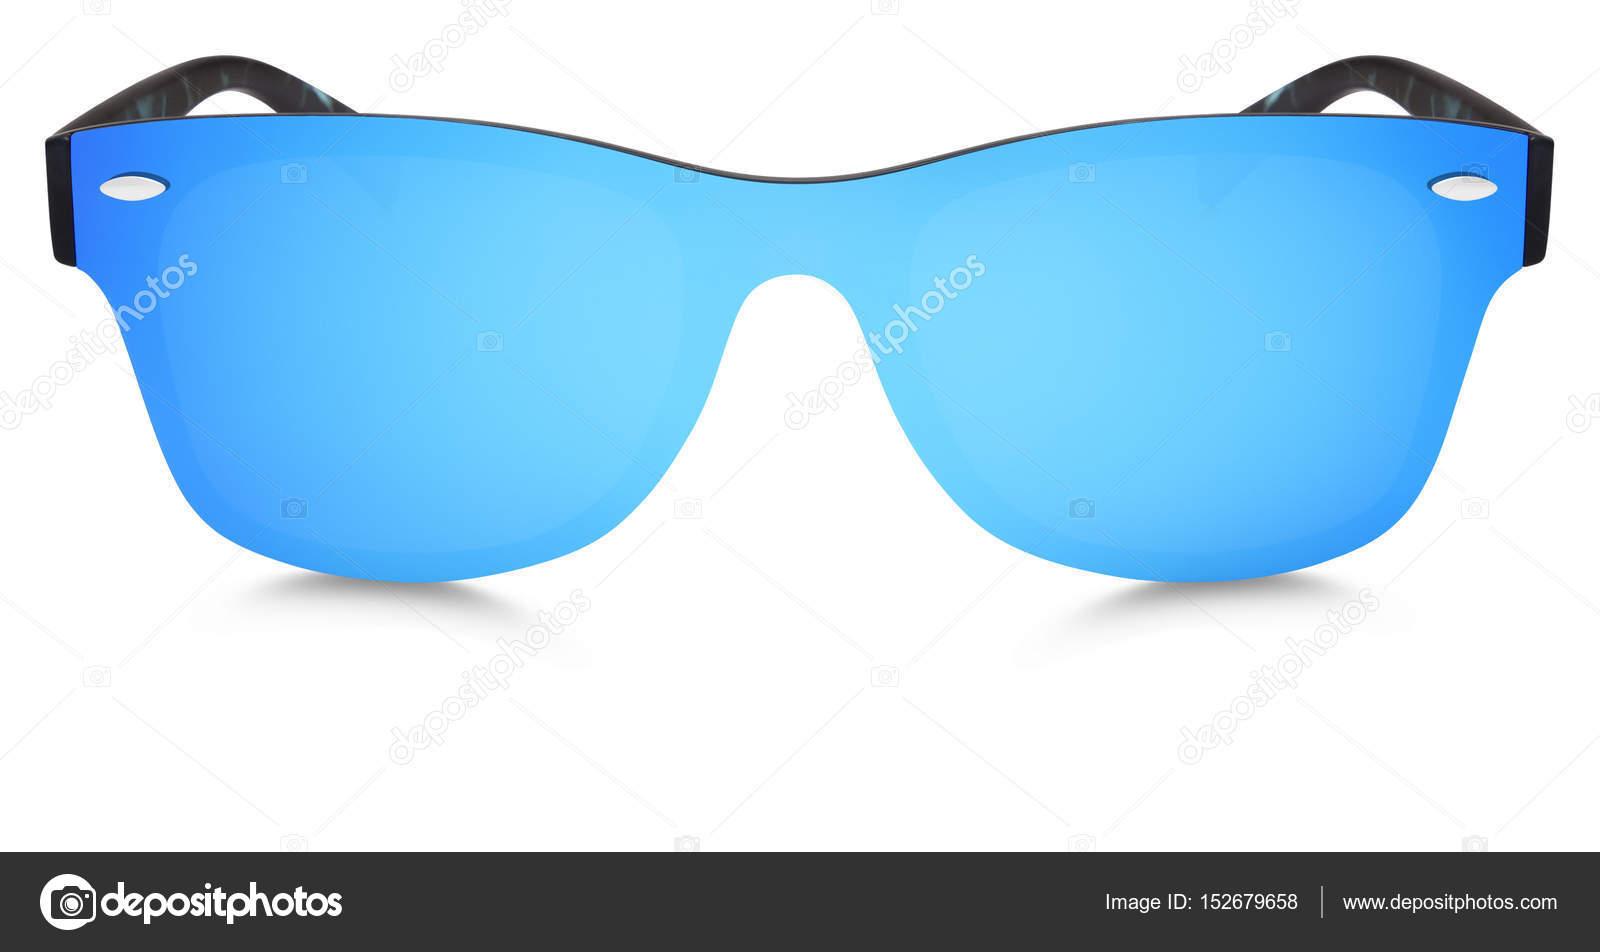 cb90341335 Καθρέφτης στίγματα γυαλιά ηλίου μπλε φακούς απομονωθεί σε λευκό φόντο —  Εικόνα από ...